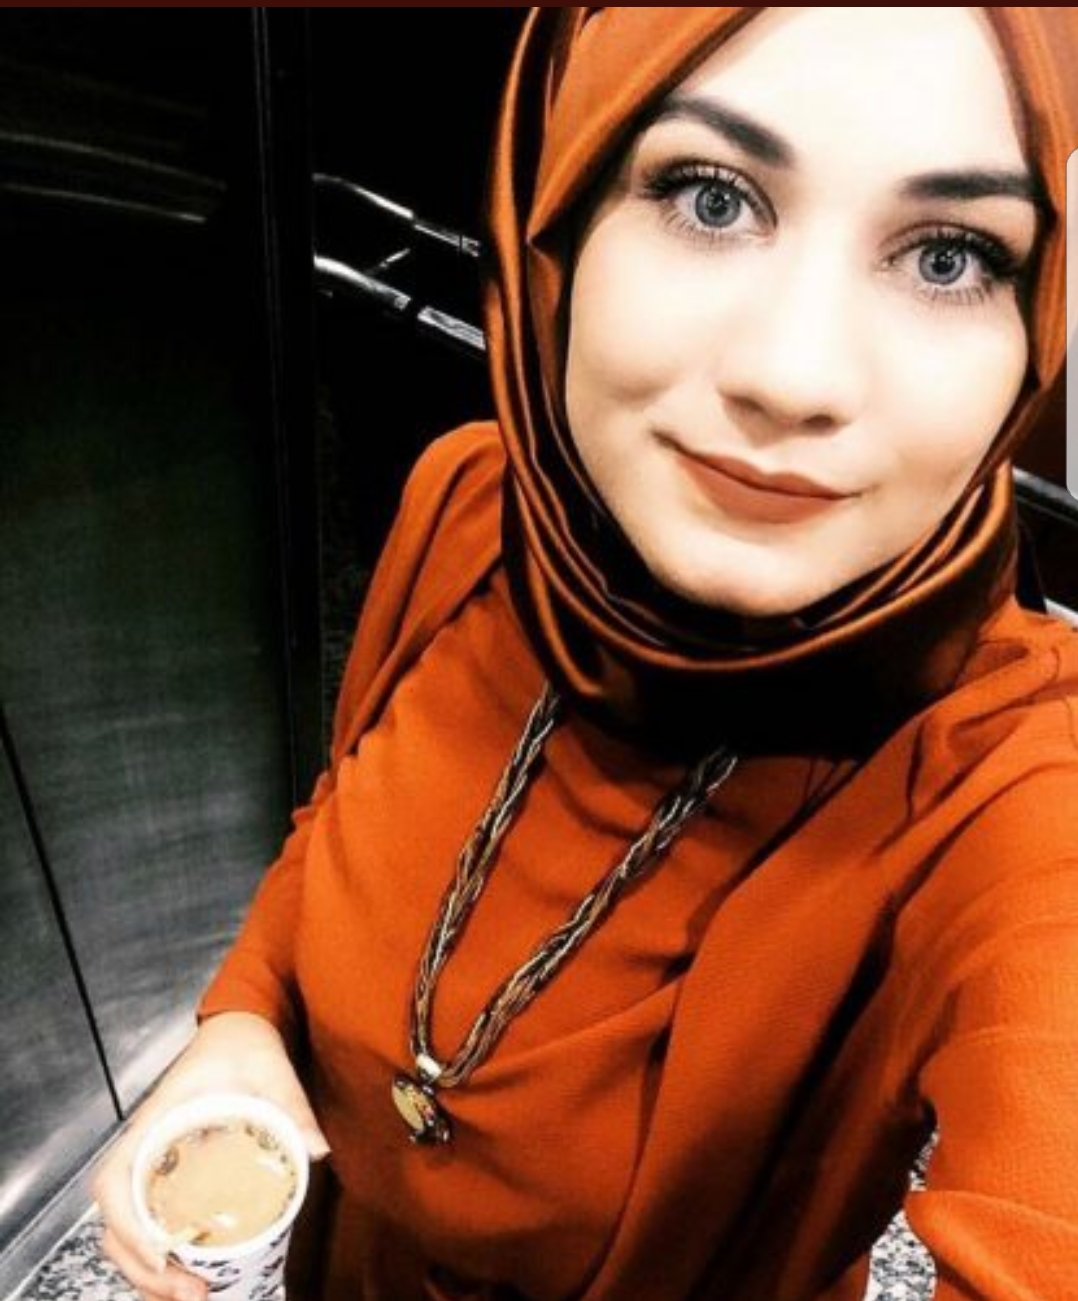 Antalya Escort Bayan Melisa